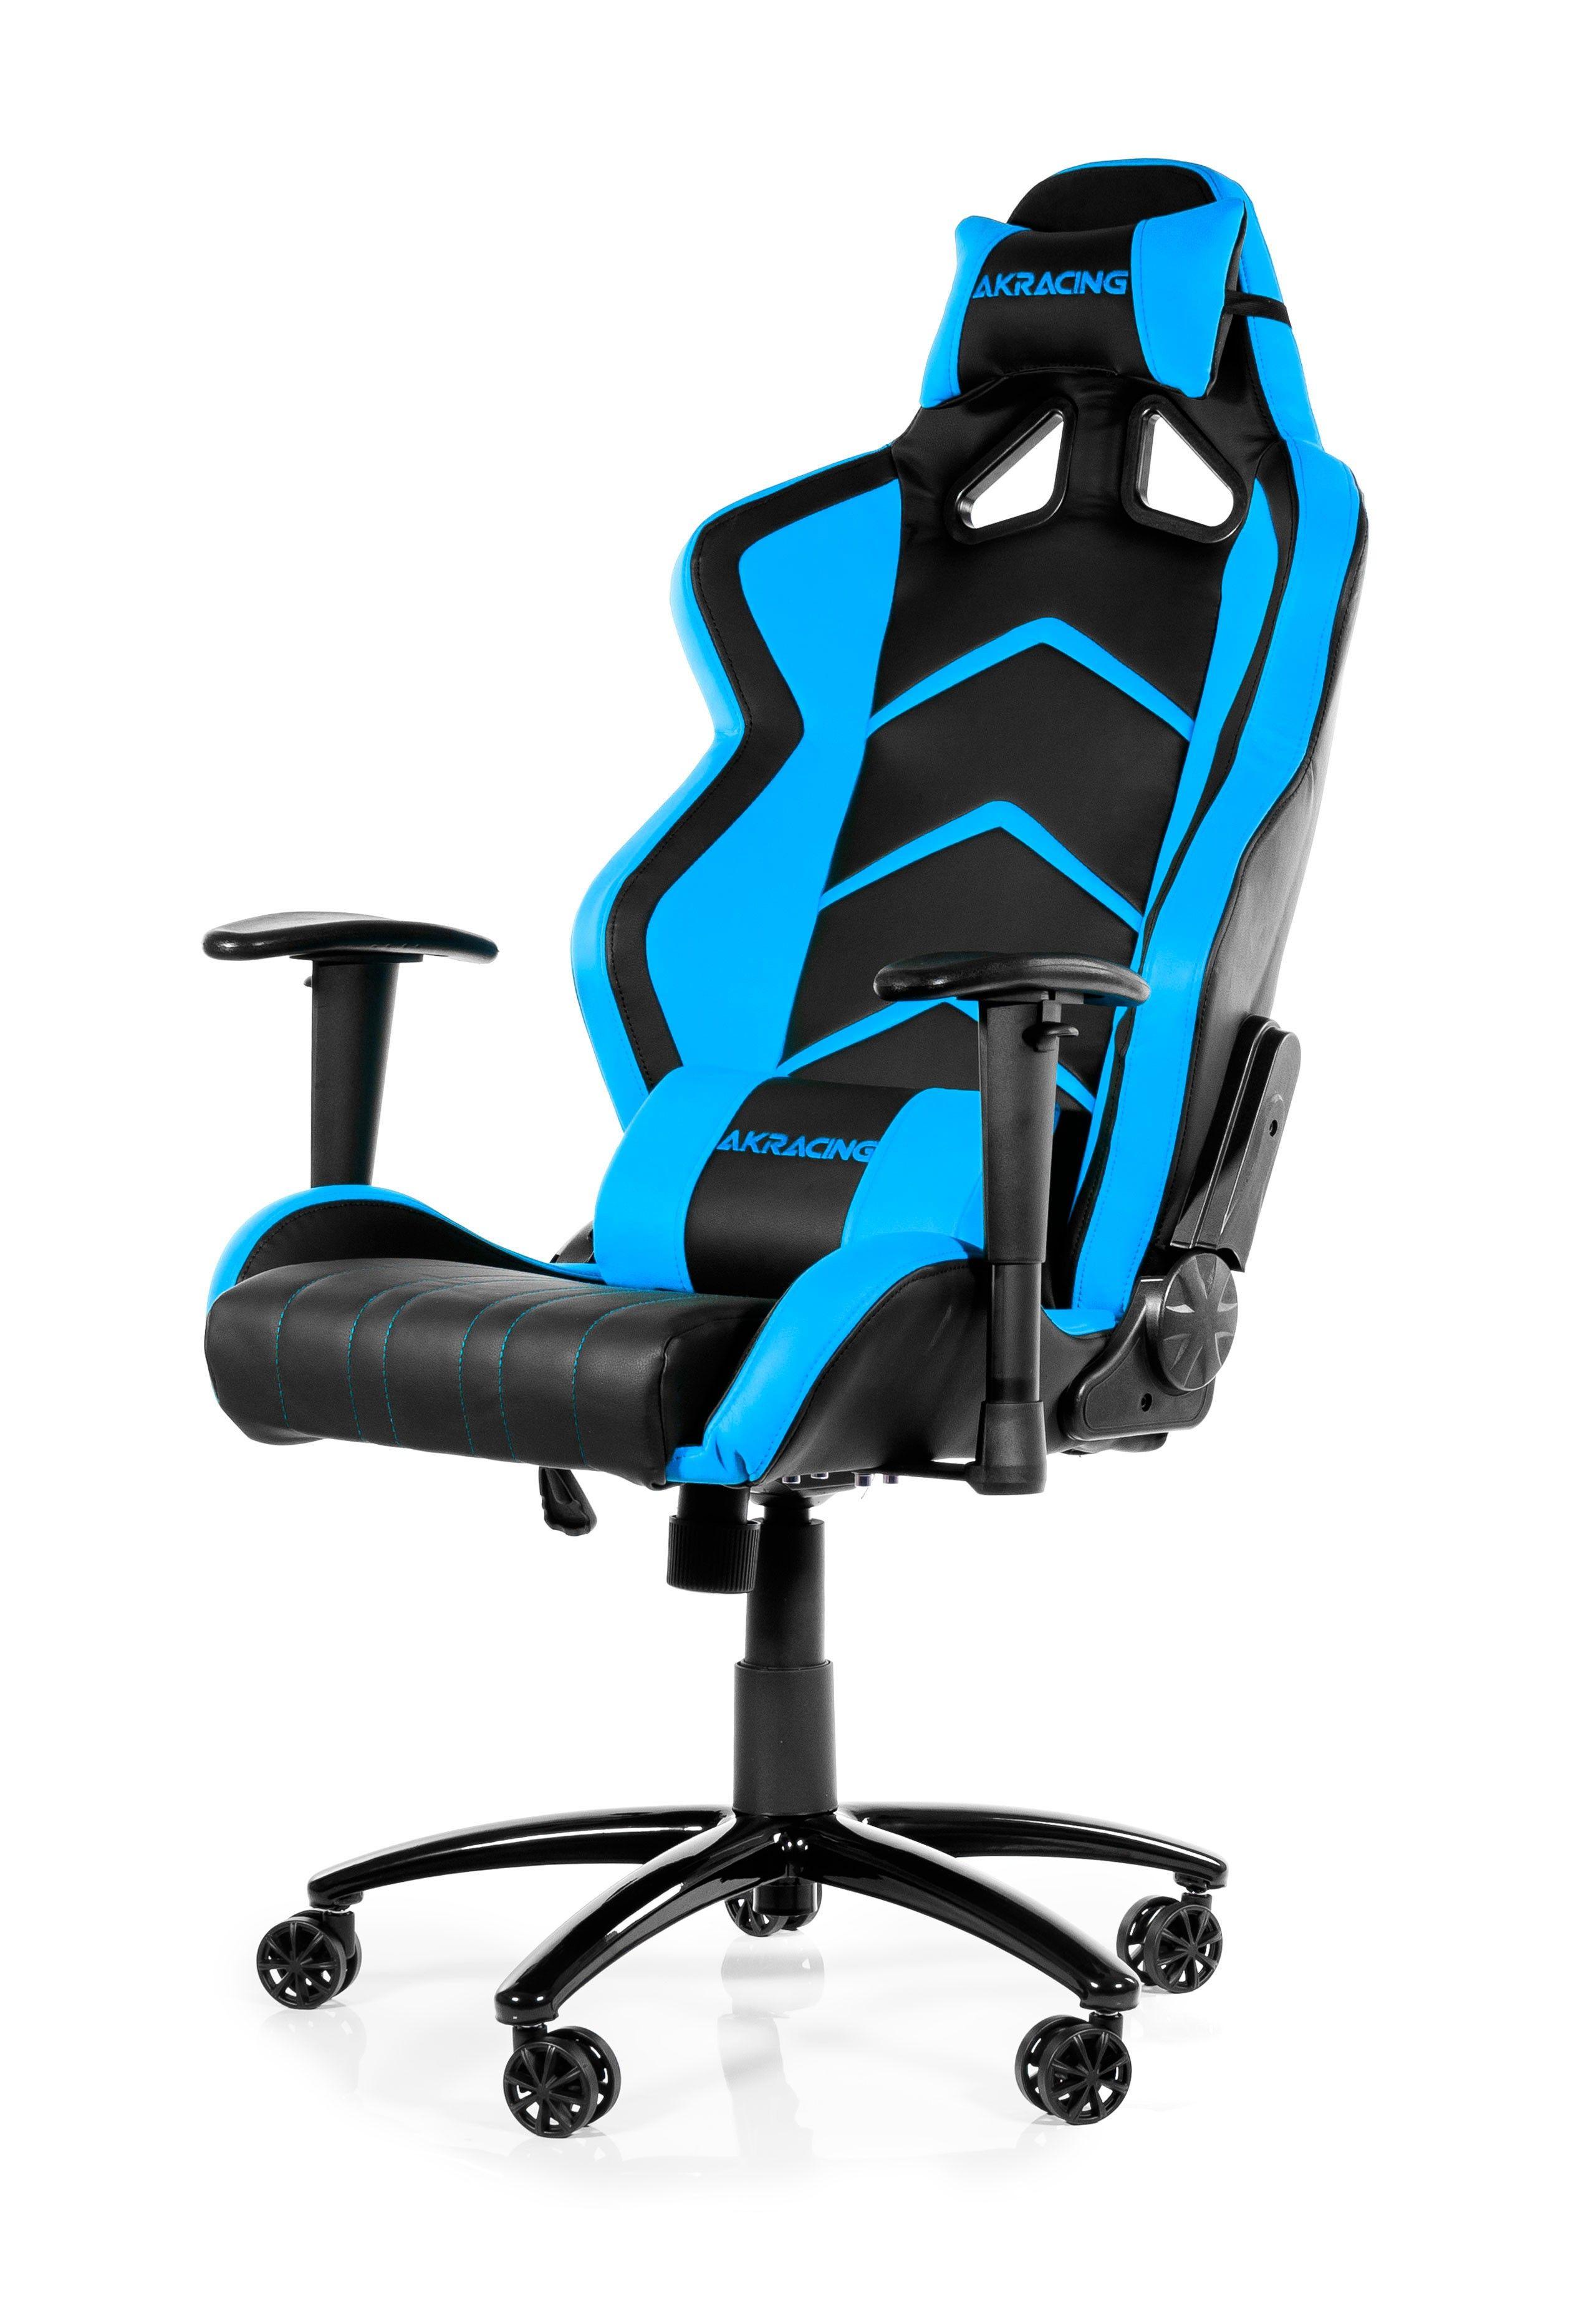 Sedia Gaming Akracing.Akracing Player Gaming Chair Blue In 2019 Gaming Desk